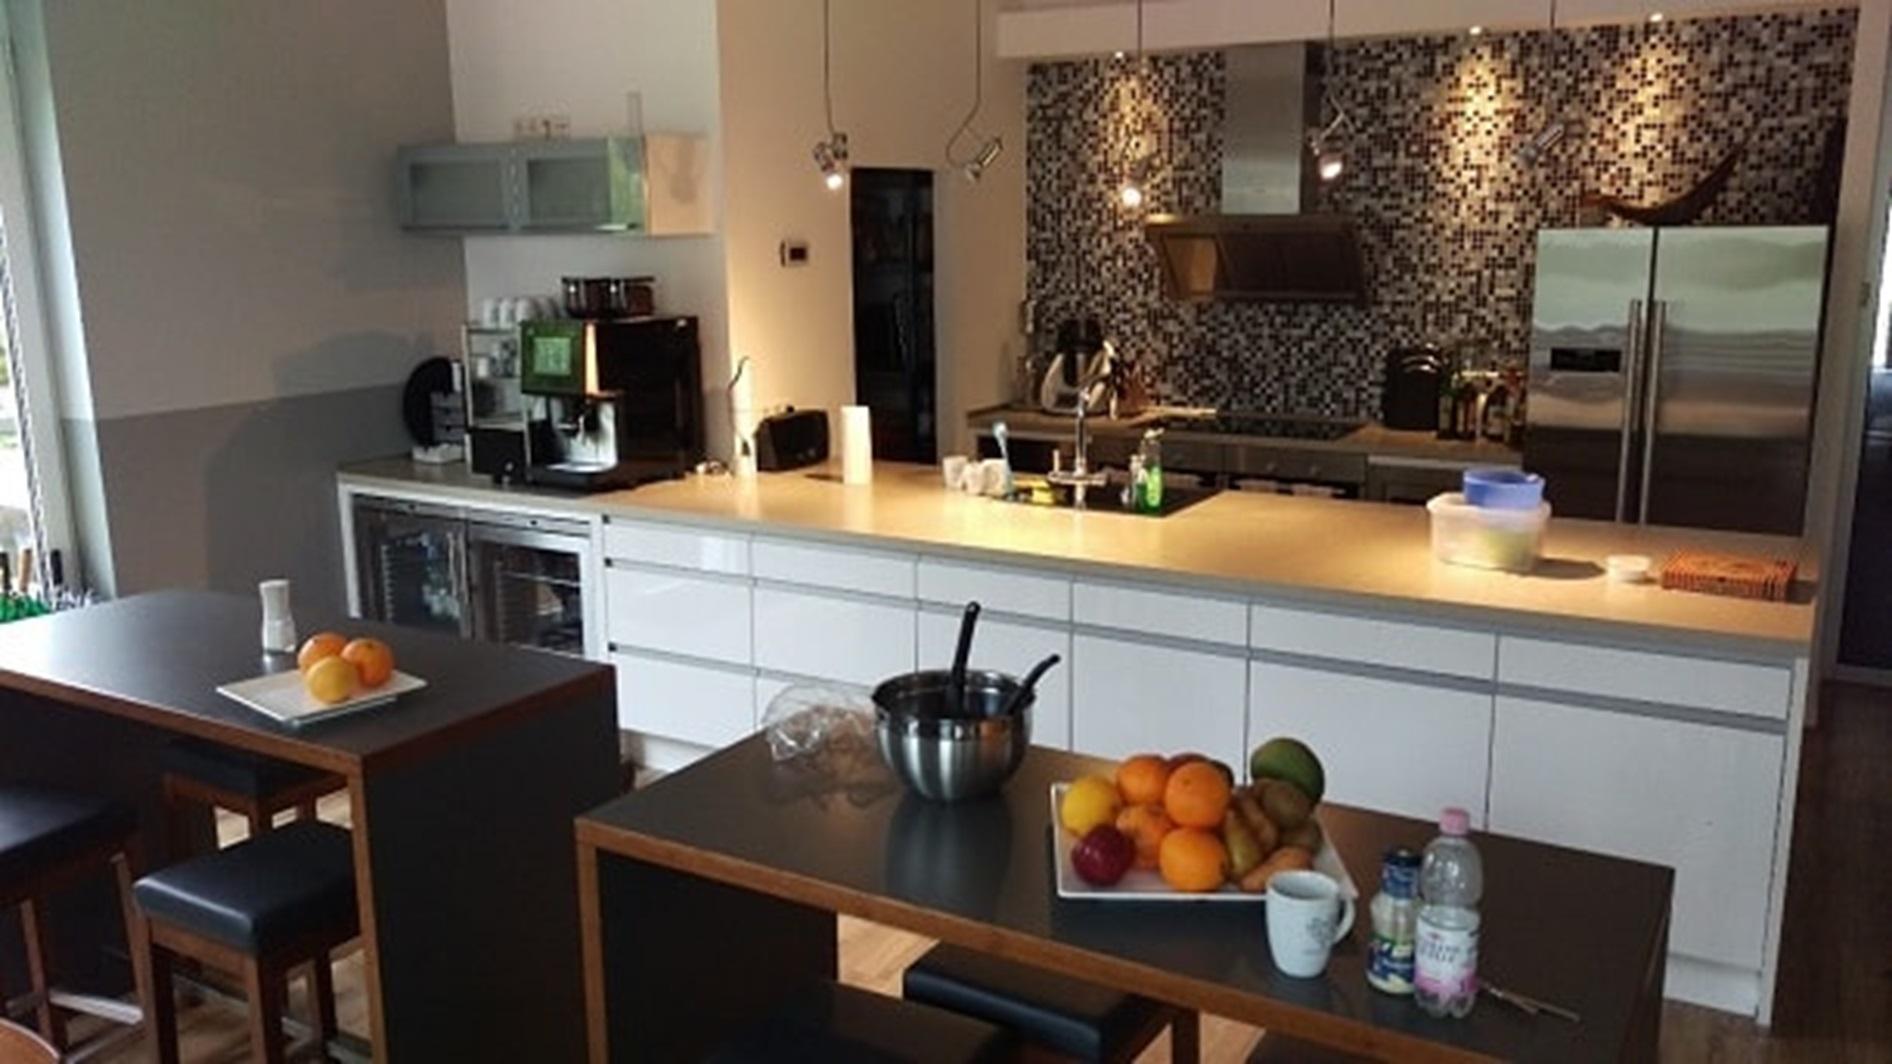 netzkern Küche